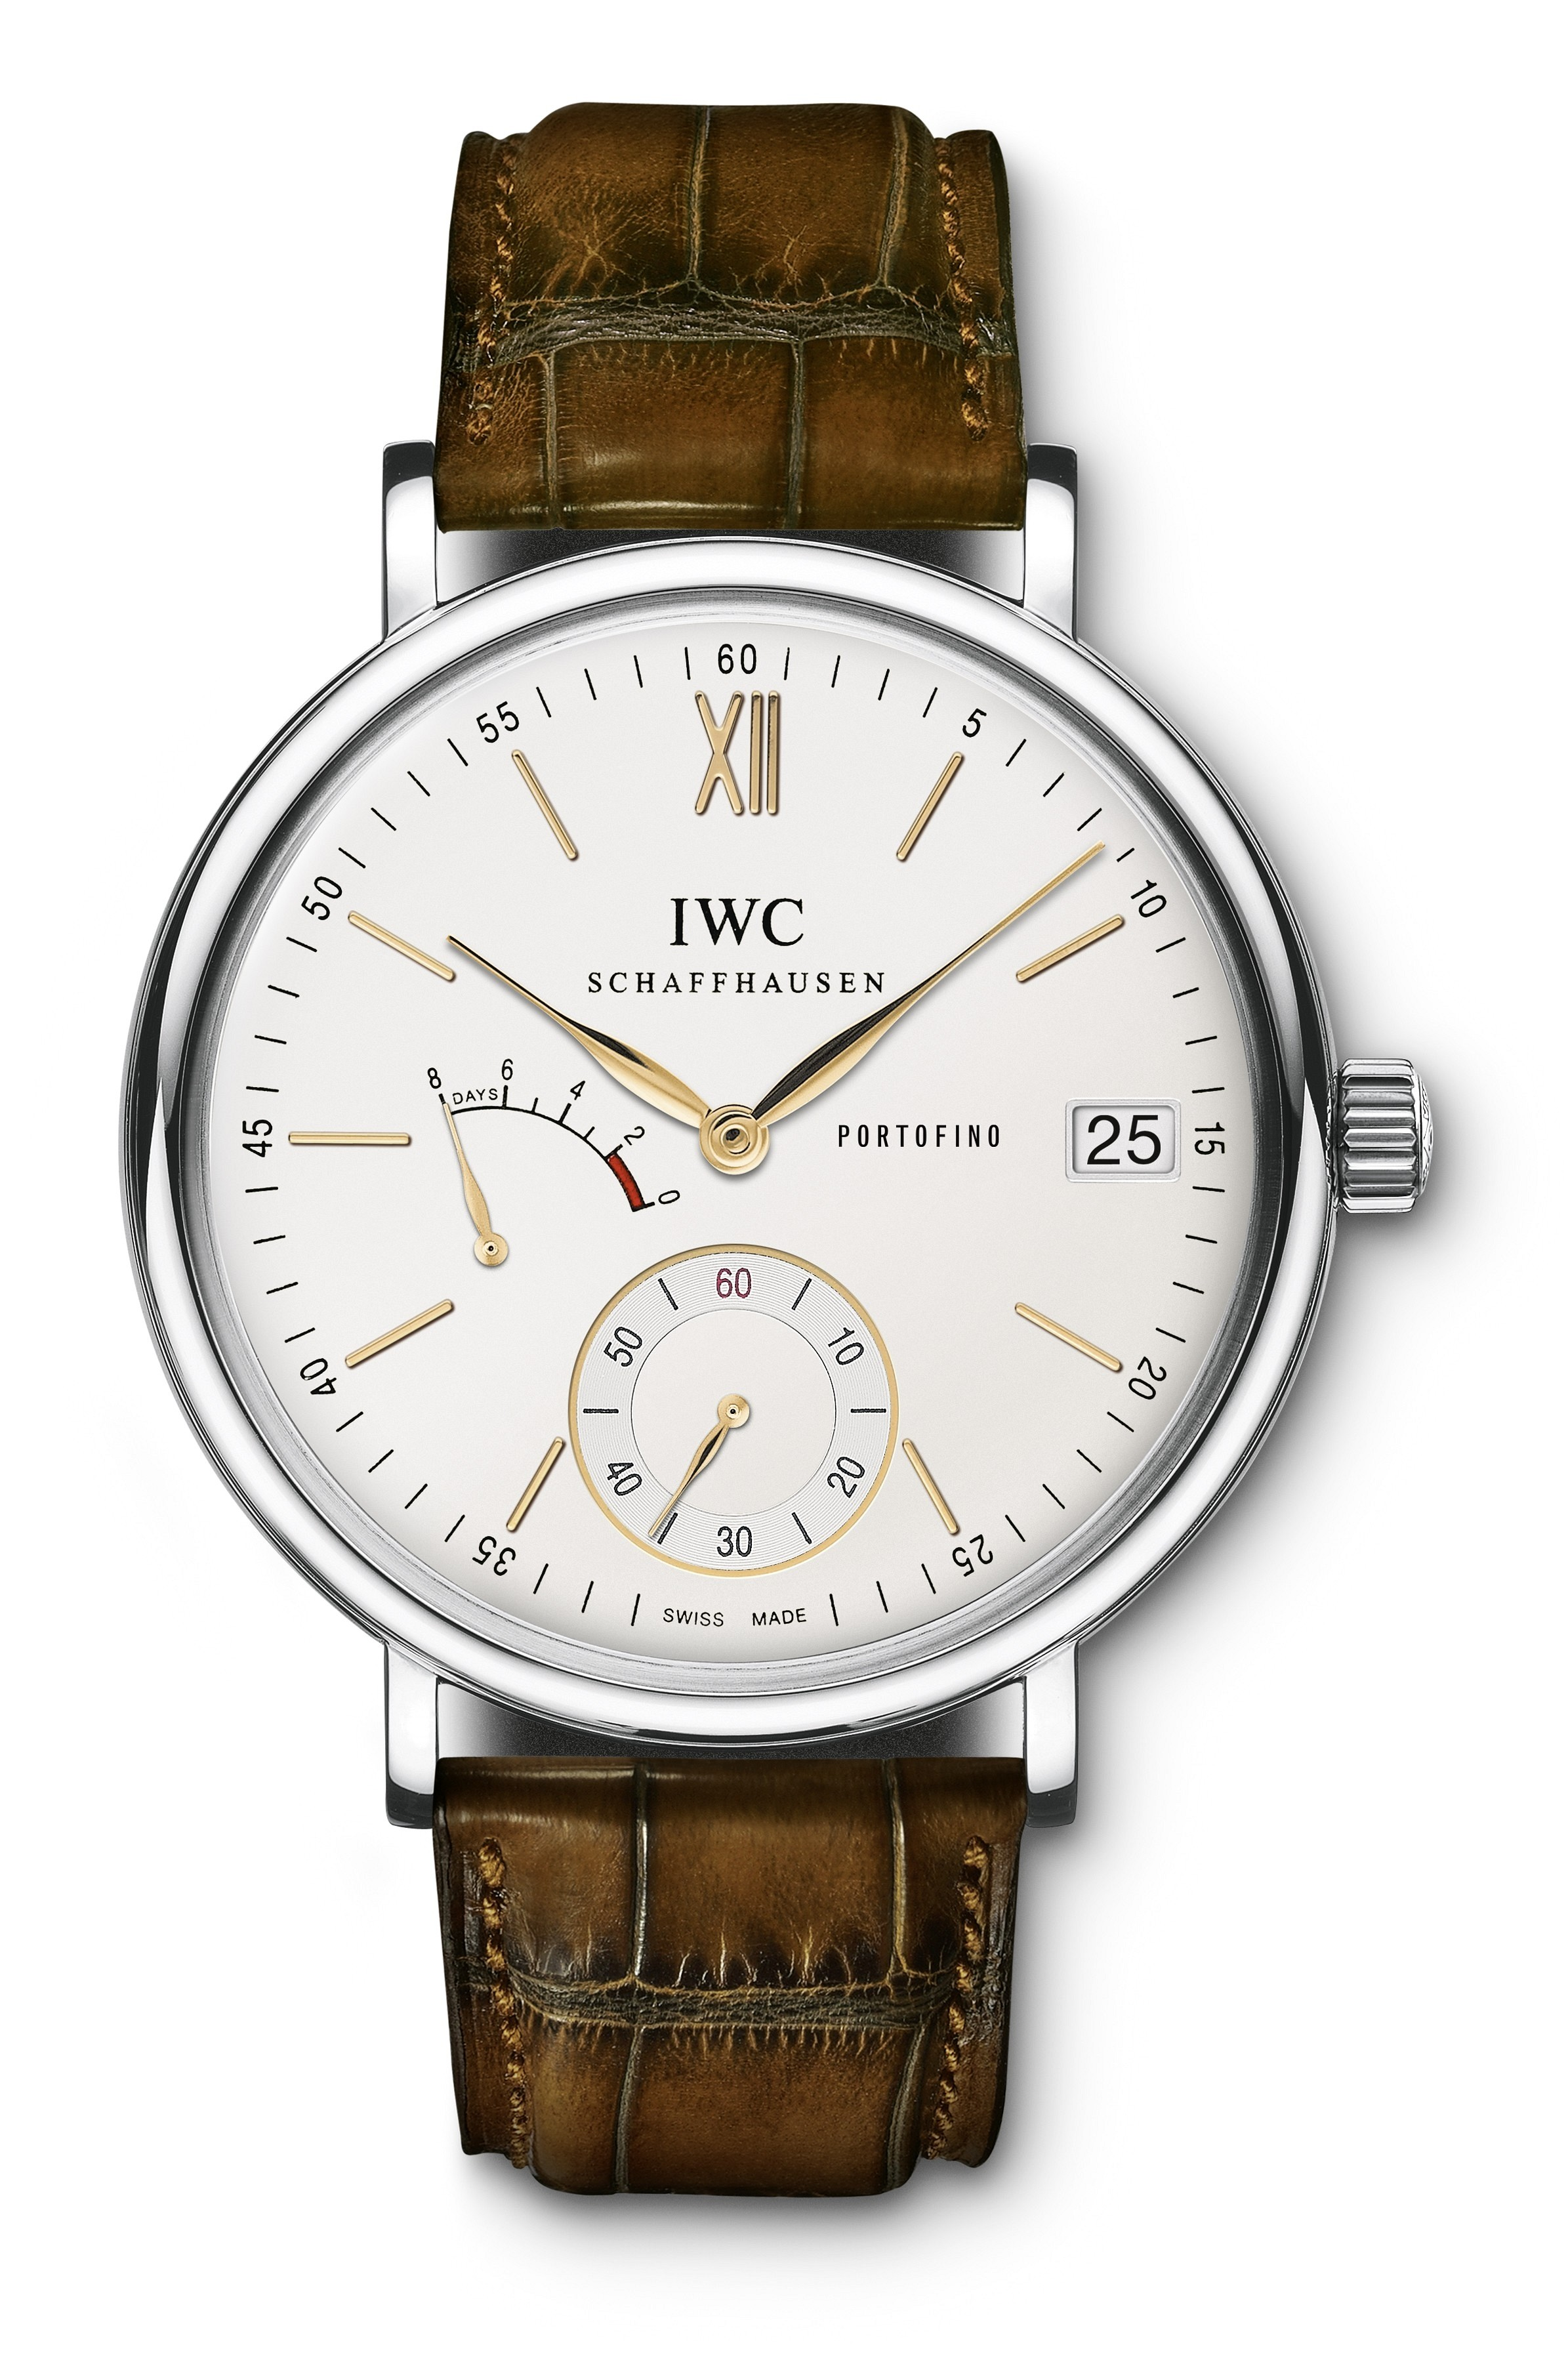 IWC Portofino IW5101-03